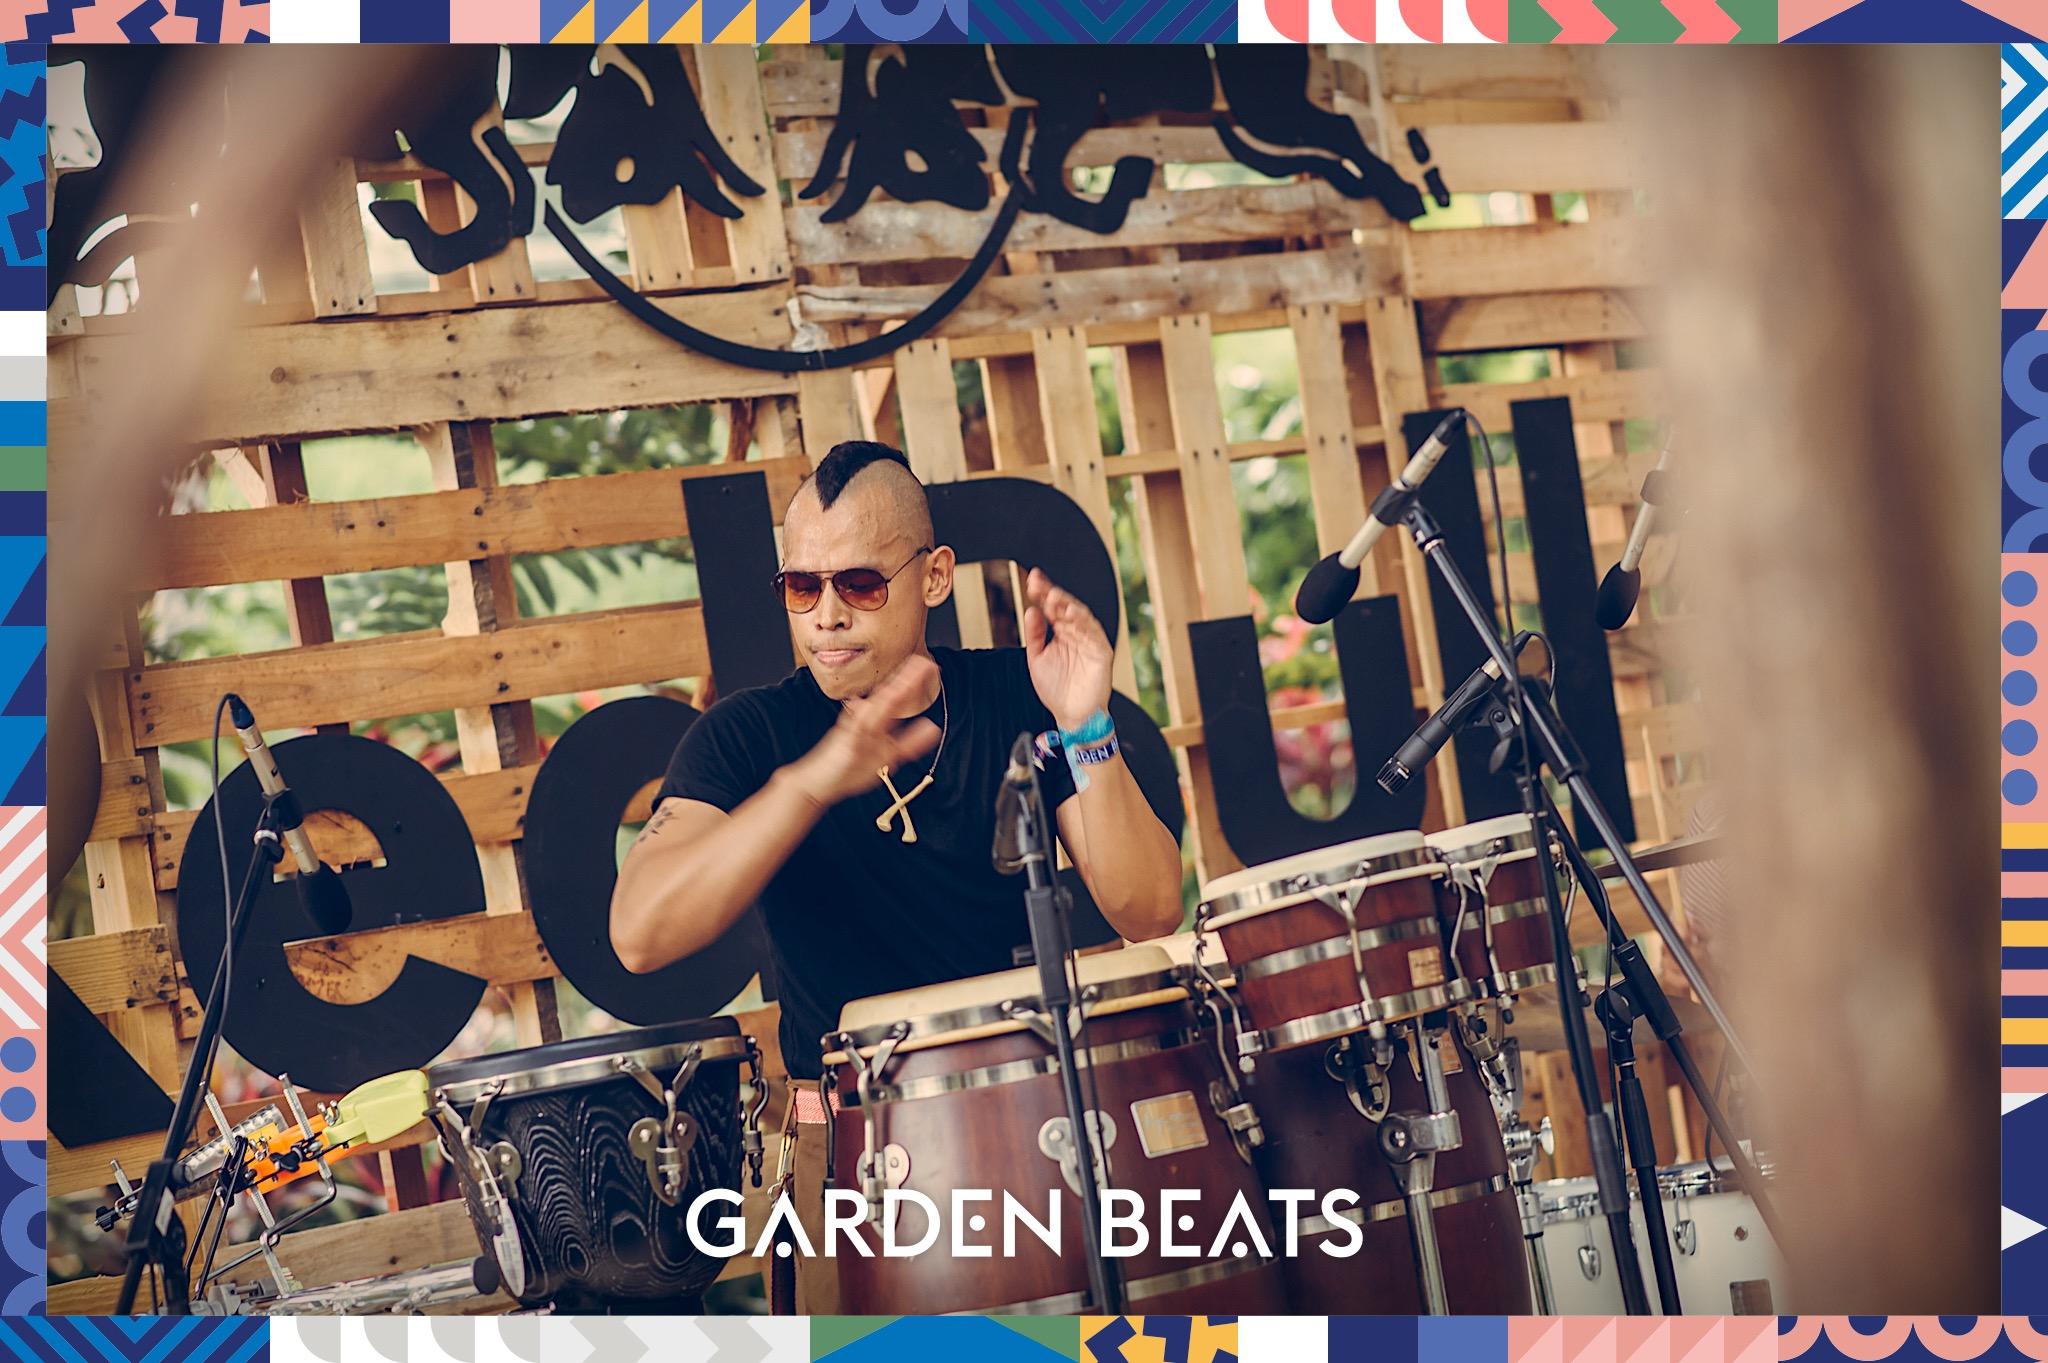 03032018_GardenBeats_Colossal360_Watermarked.jpg